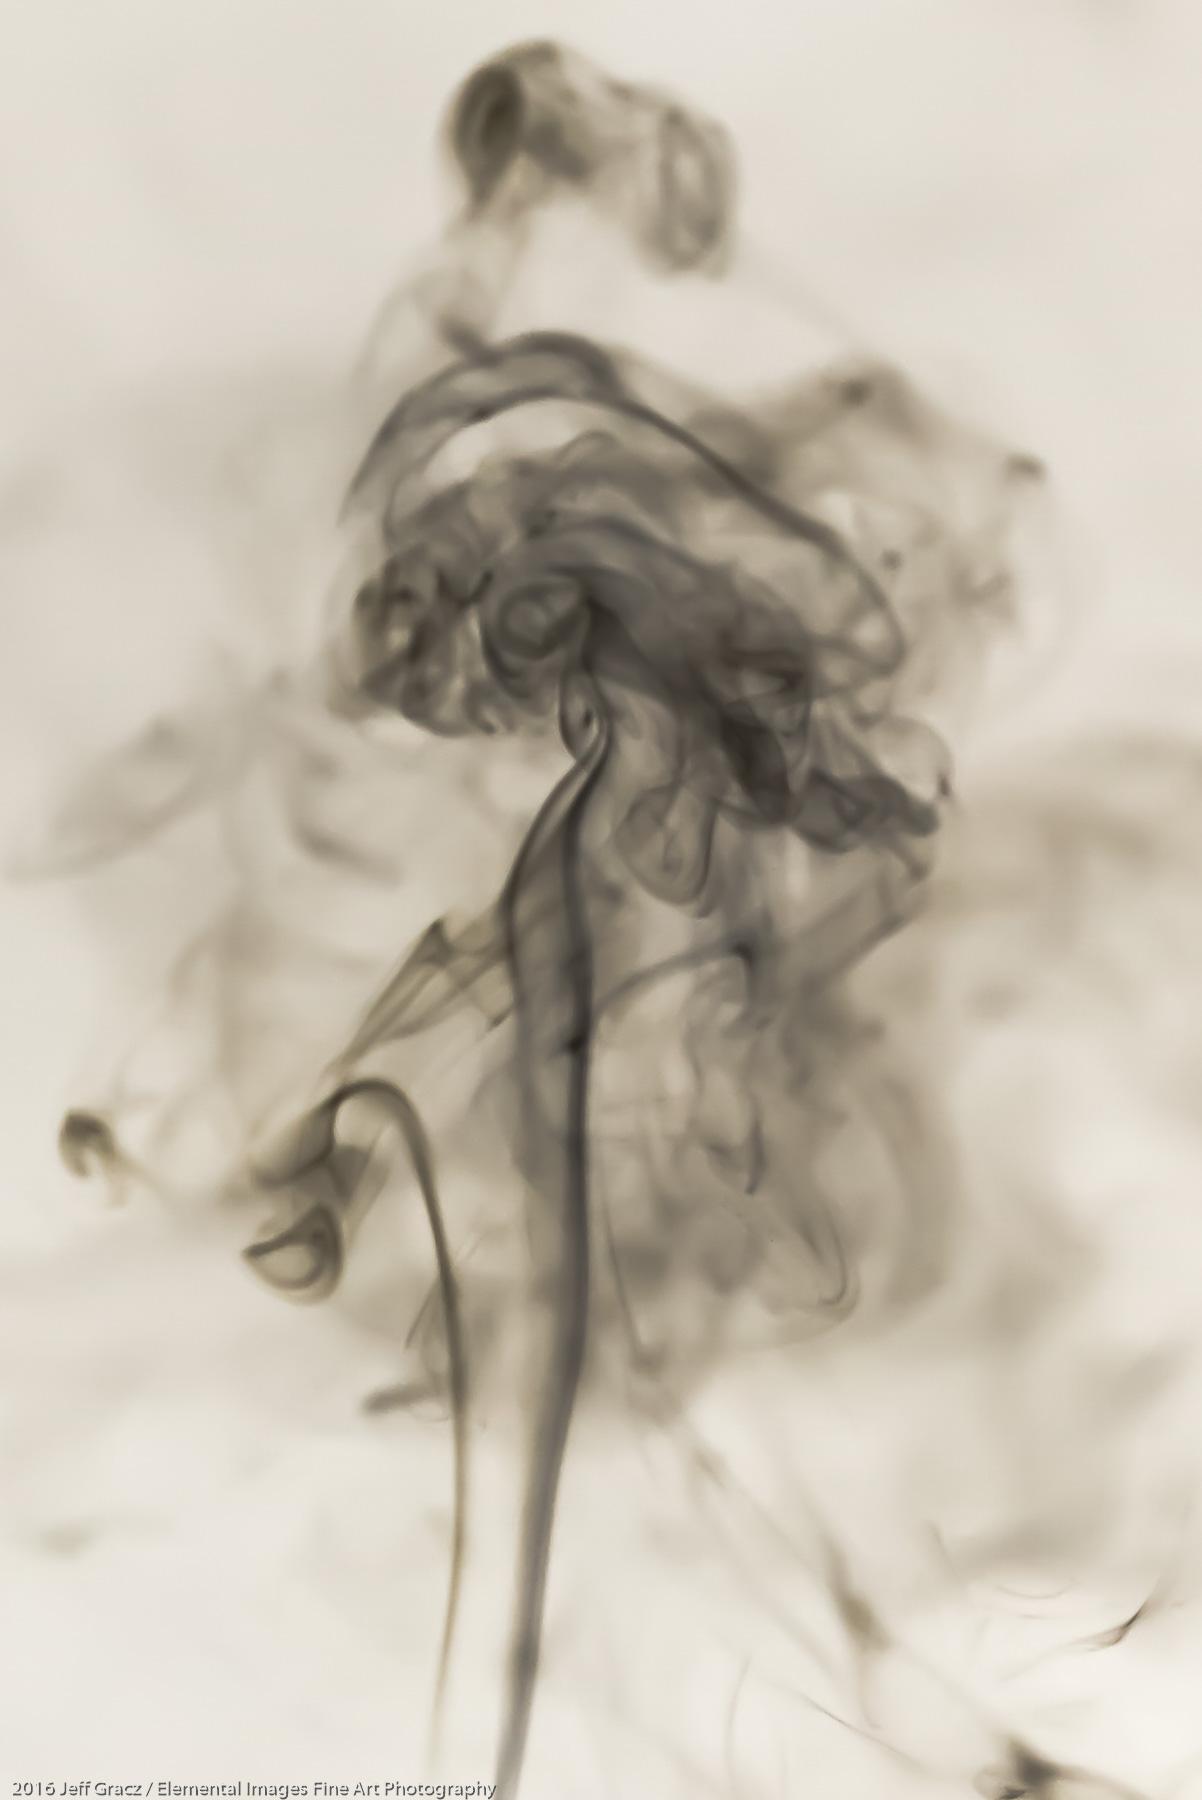 Smoke 27 | Vancouver | WA | USA - © 2016 Jeff Gracz / Elemental Images Fine Art Photography - All Rights Reserved Worldwide